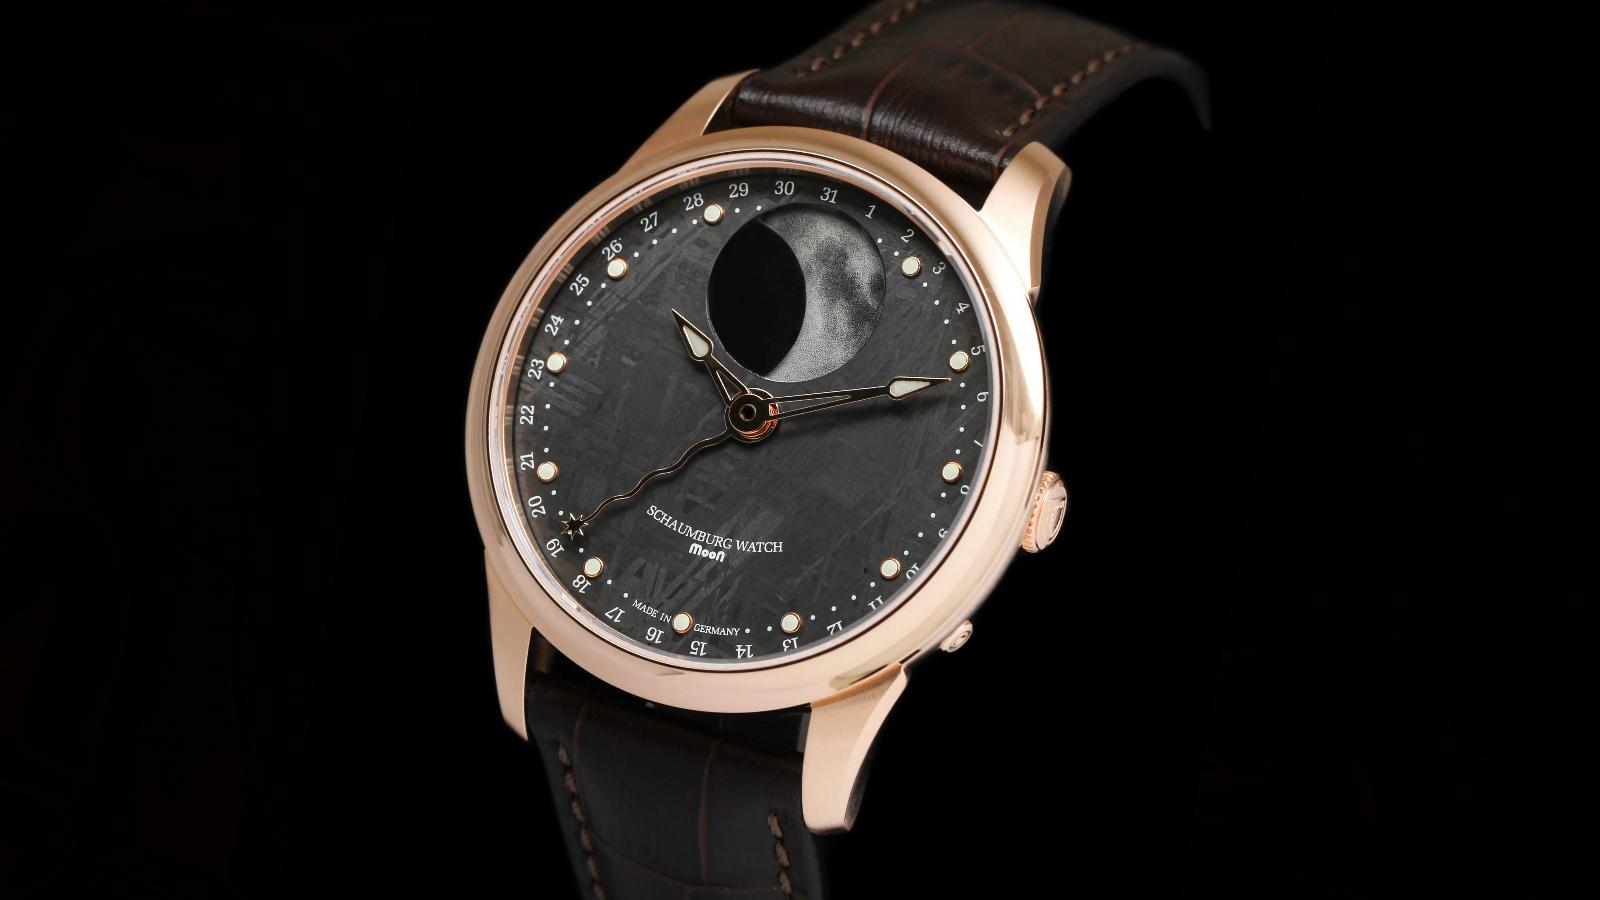 Schaumburg Watch MooN Meteor 18Kt rose gold